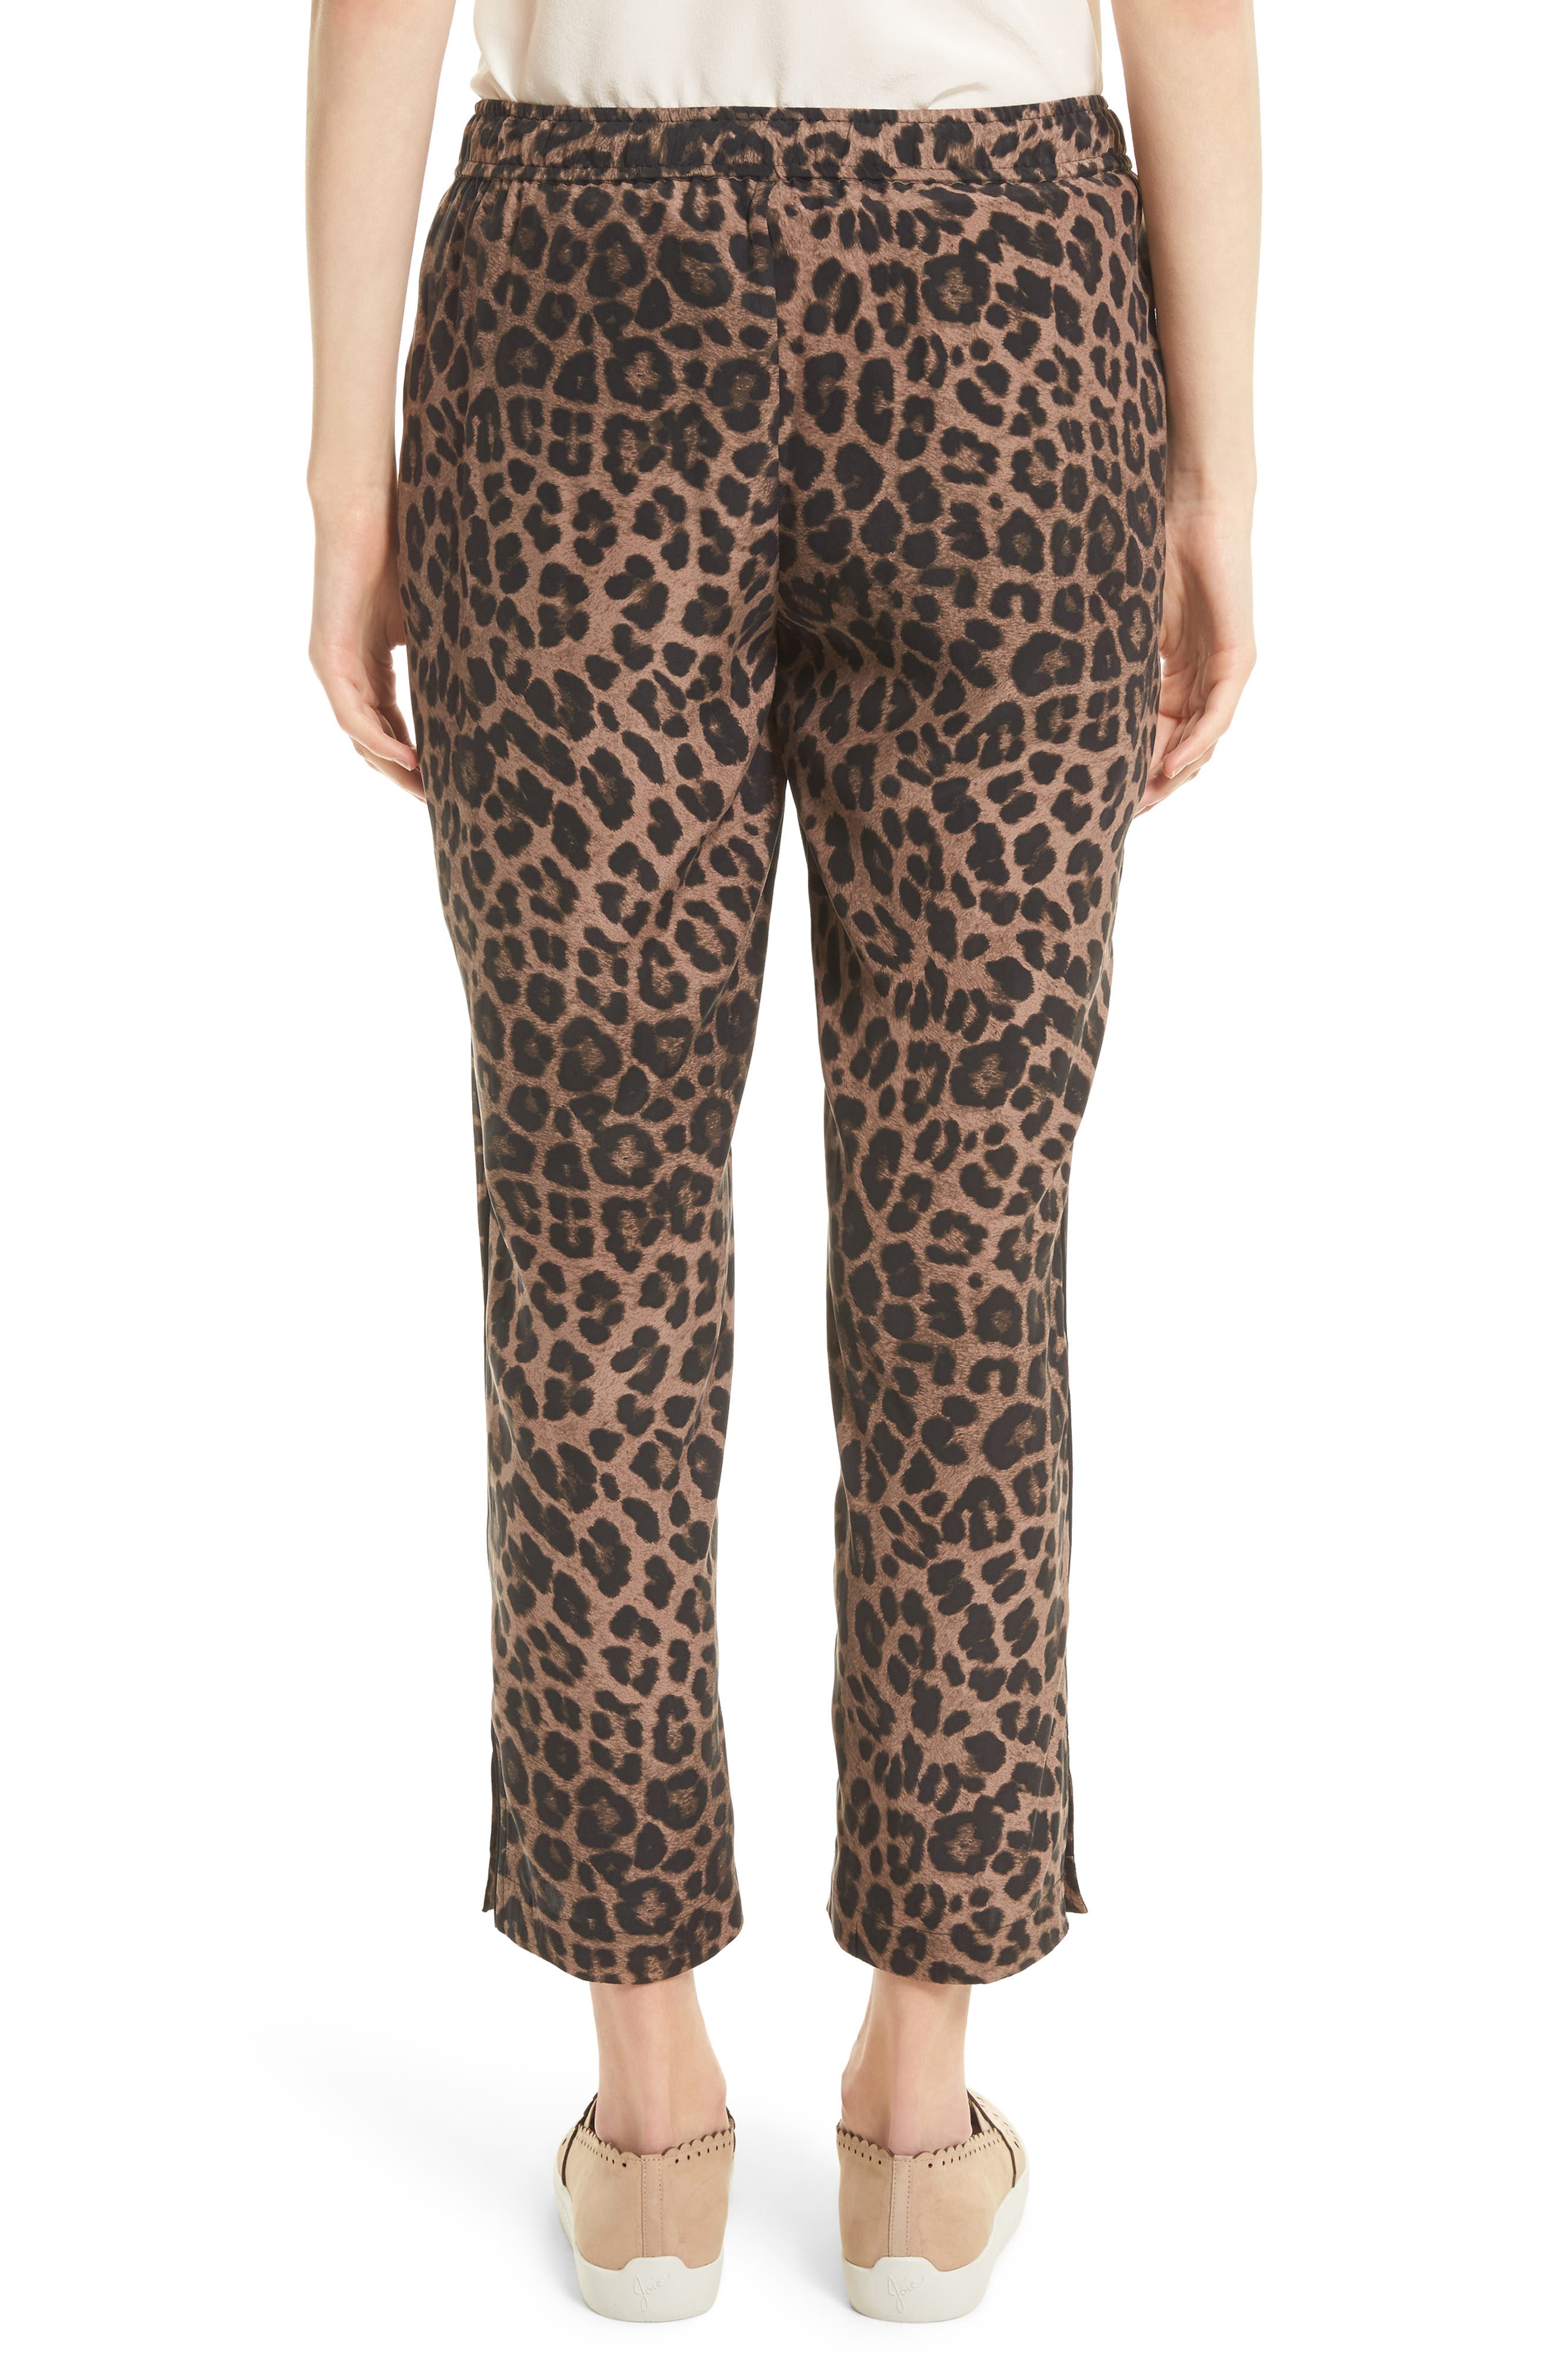 Ayanna B Leopard Print Silk Crop Pants,                             Alternate thumbnail 2, color,                             005